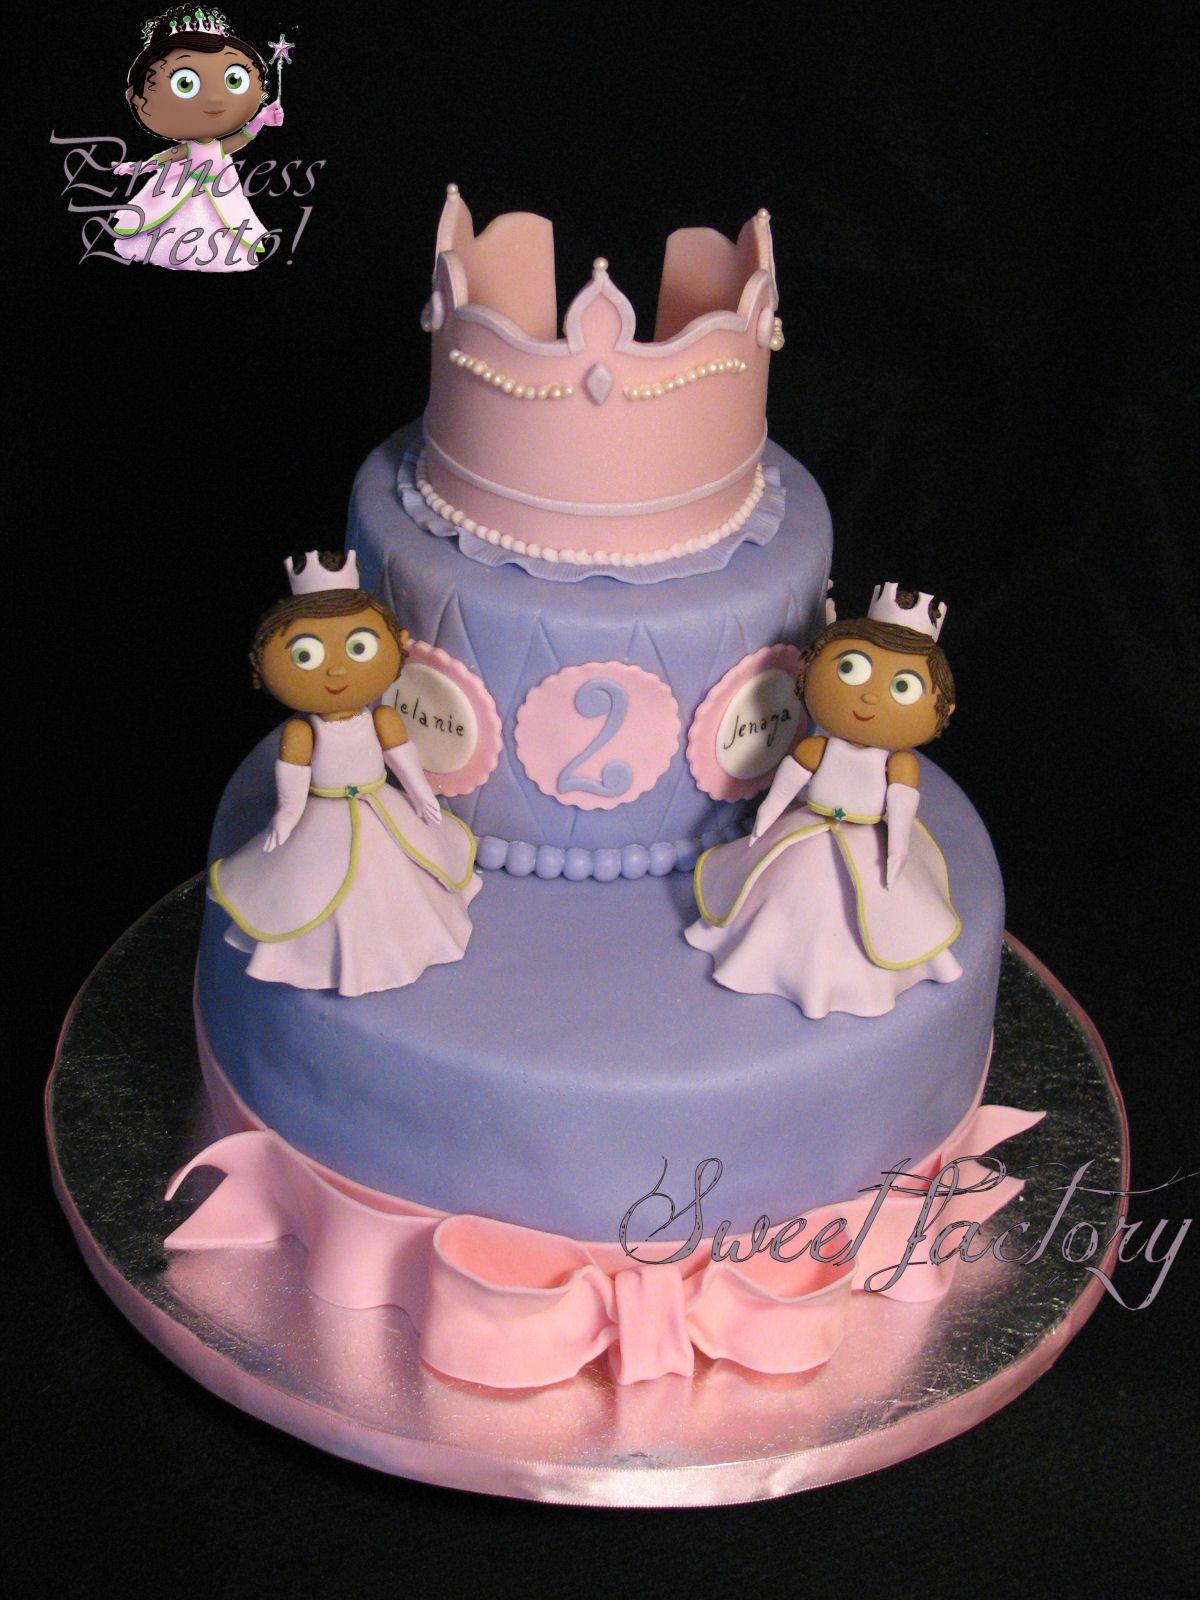 Fabulous Super Why Cake Princess Presto Cake Super Why Birthday Cake Personalised Birthday Cards Paralily Jamesorg